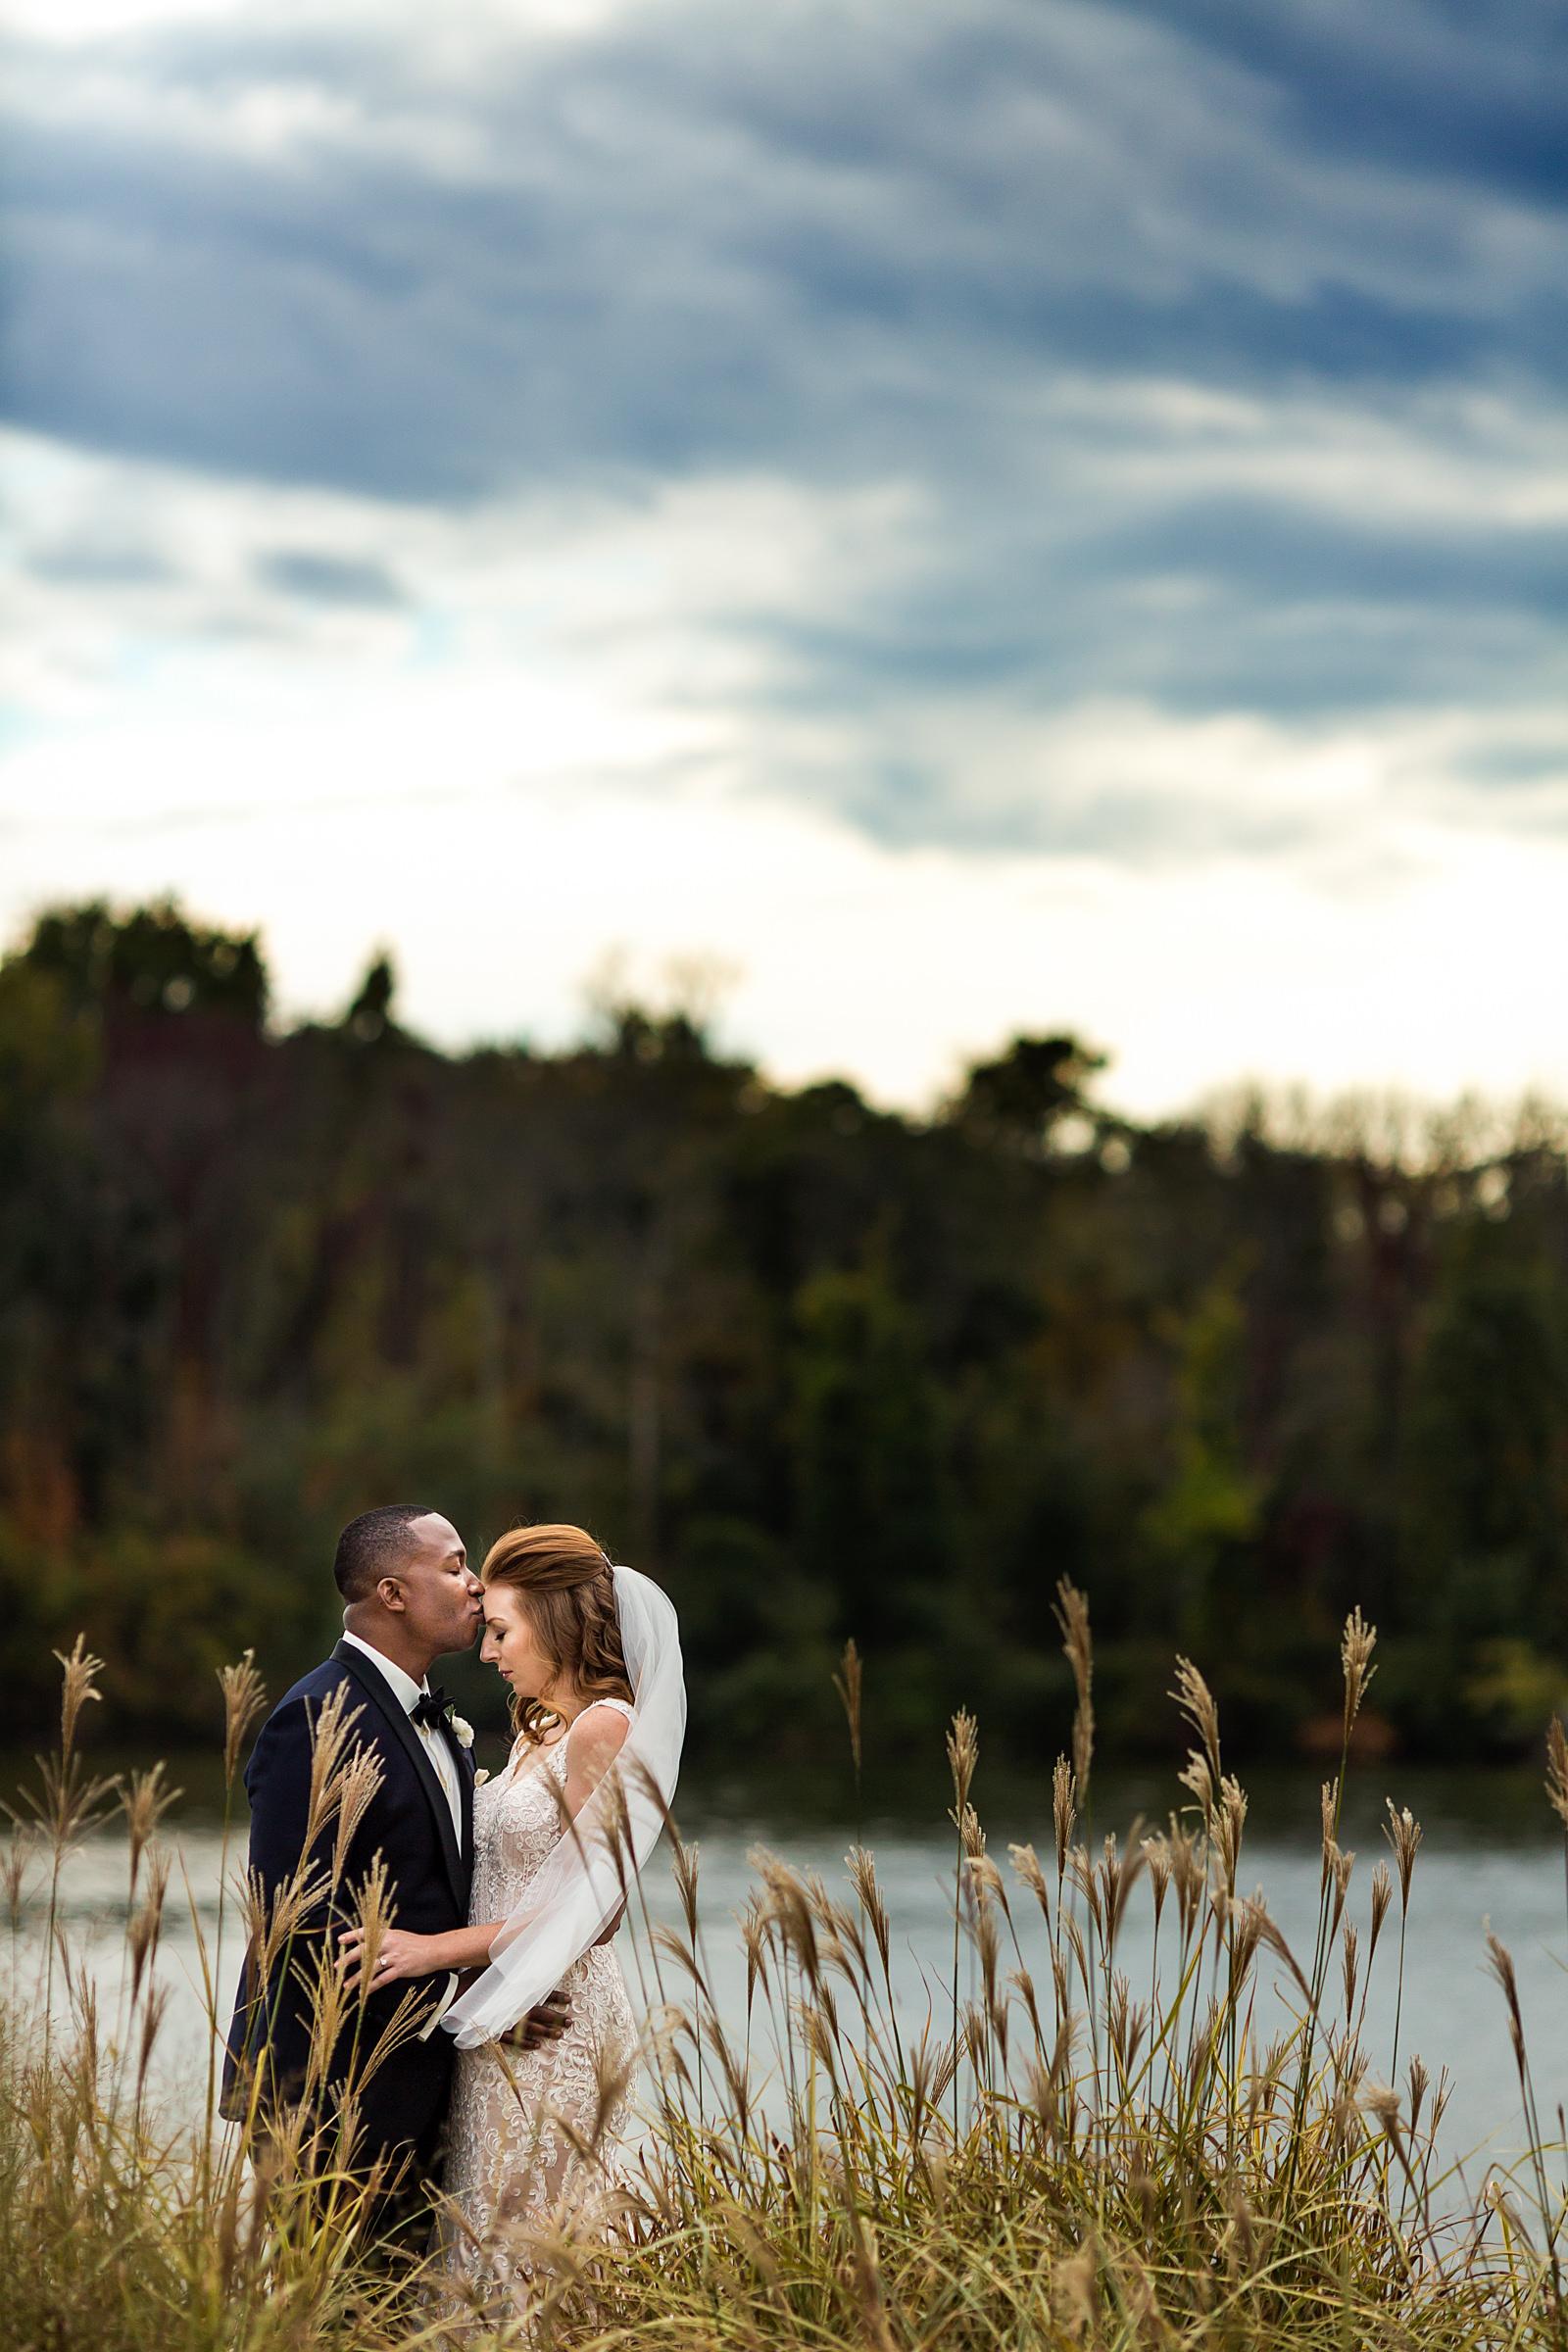 Couple portrait against grasses - photo by Procopio Photography